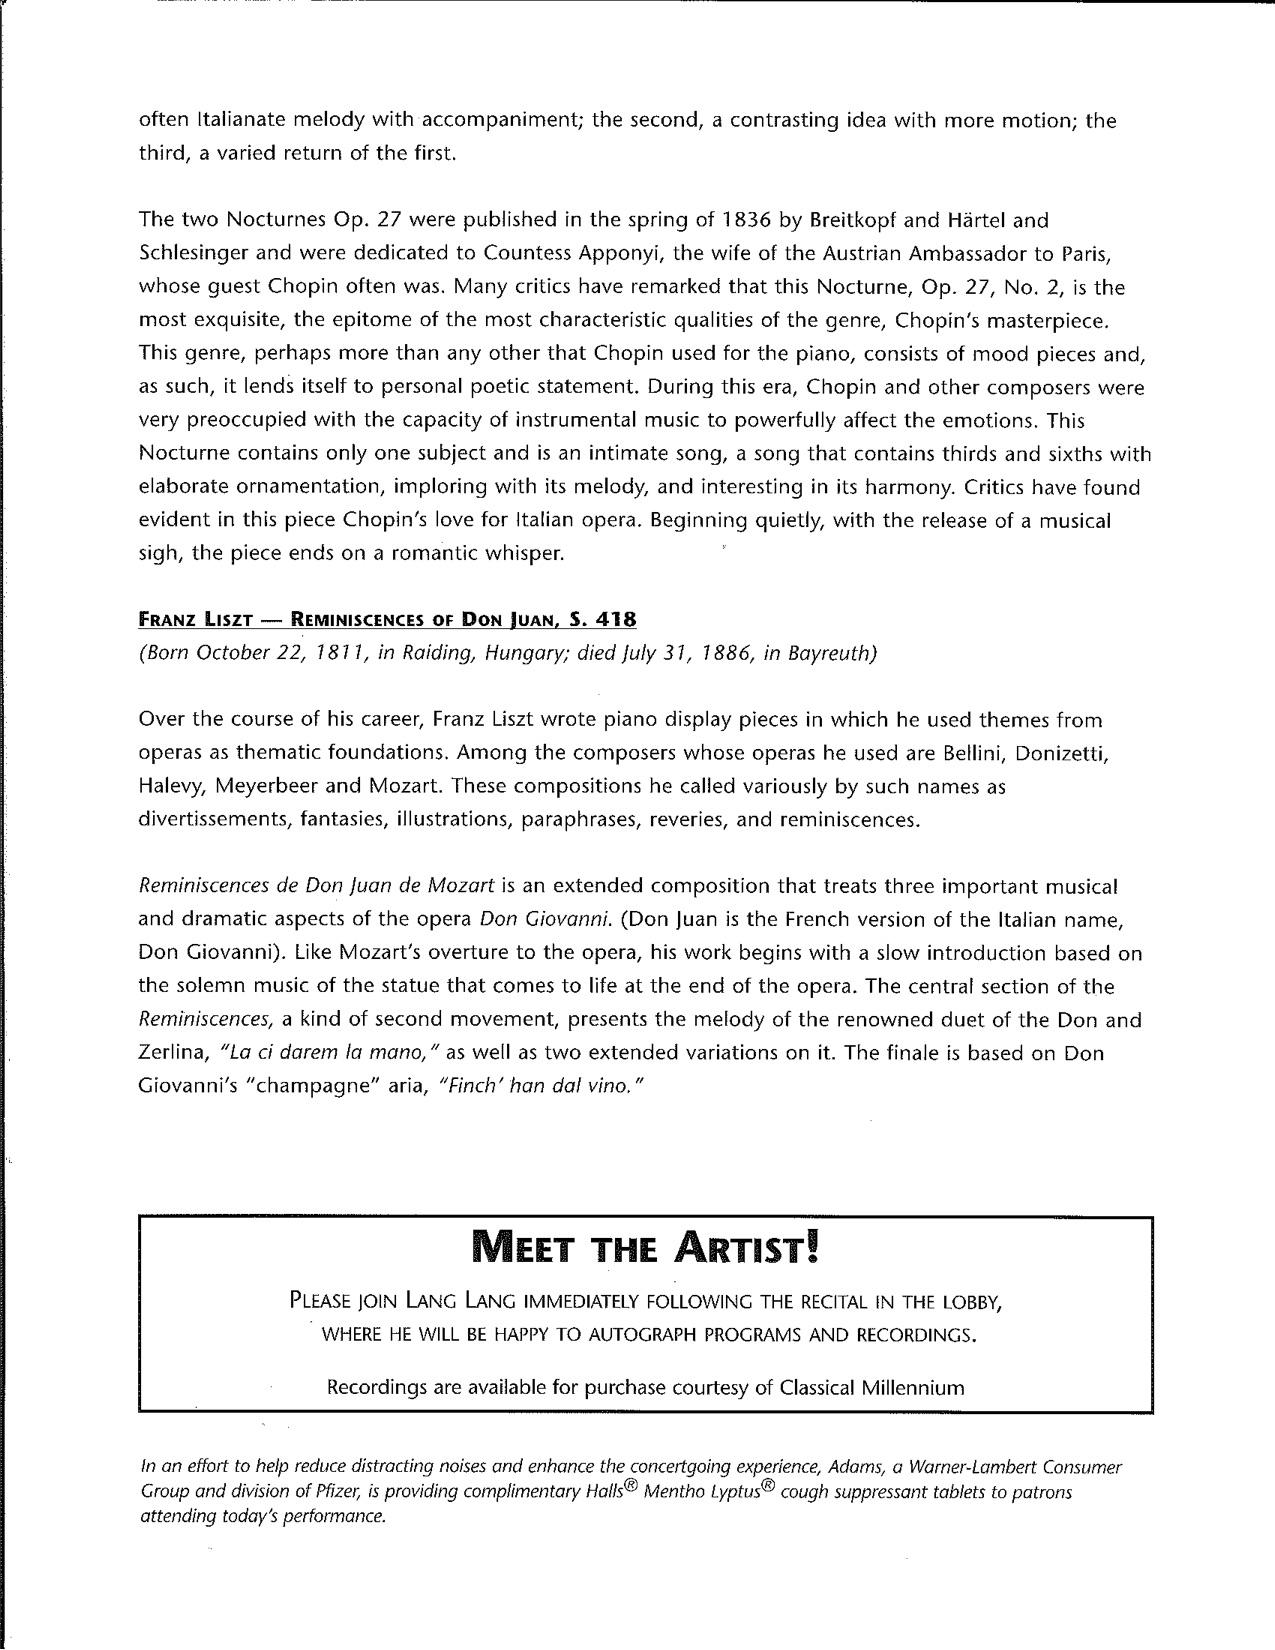 LangLang02-03_Program10.jpg